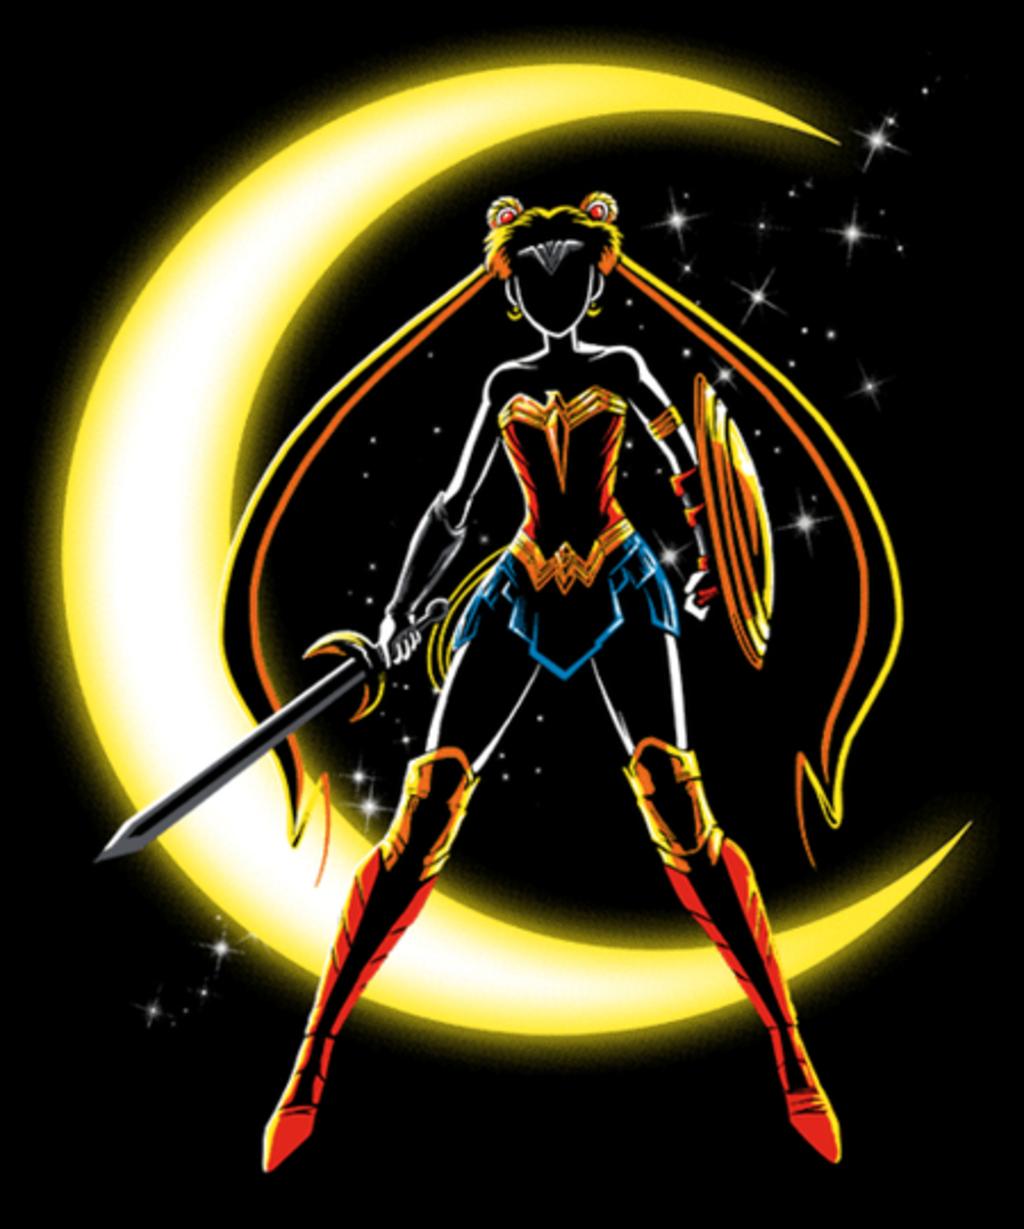 Qwertee: Wonder Moon